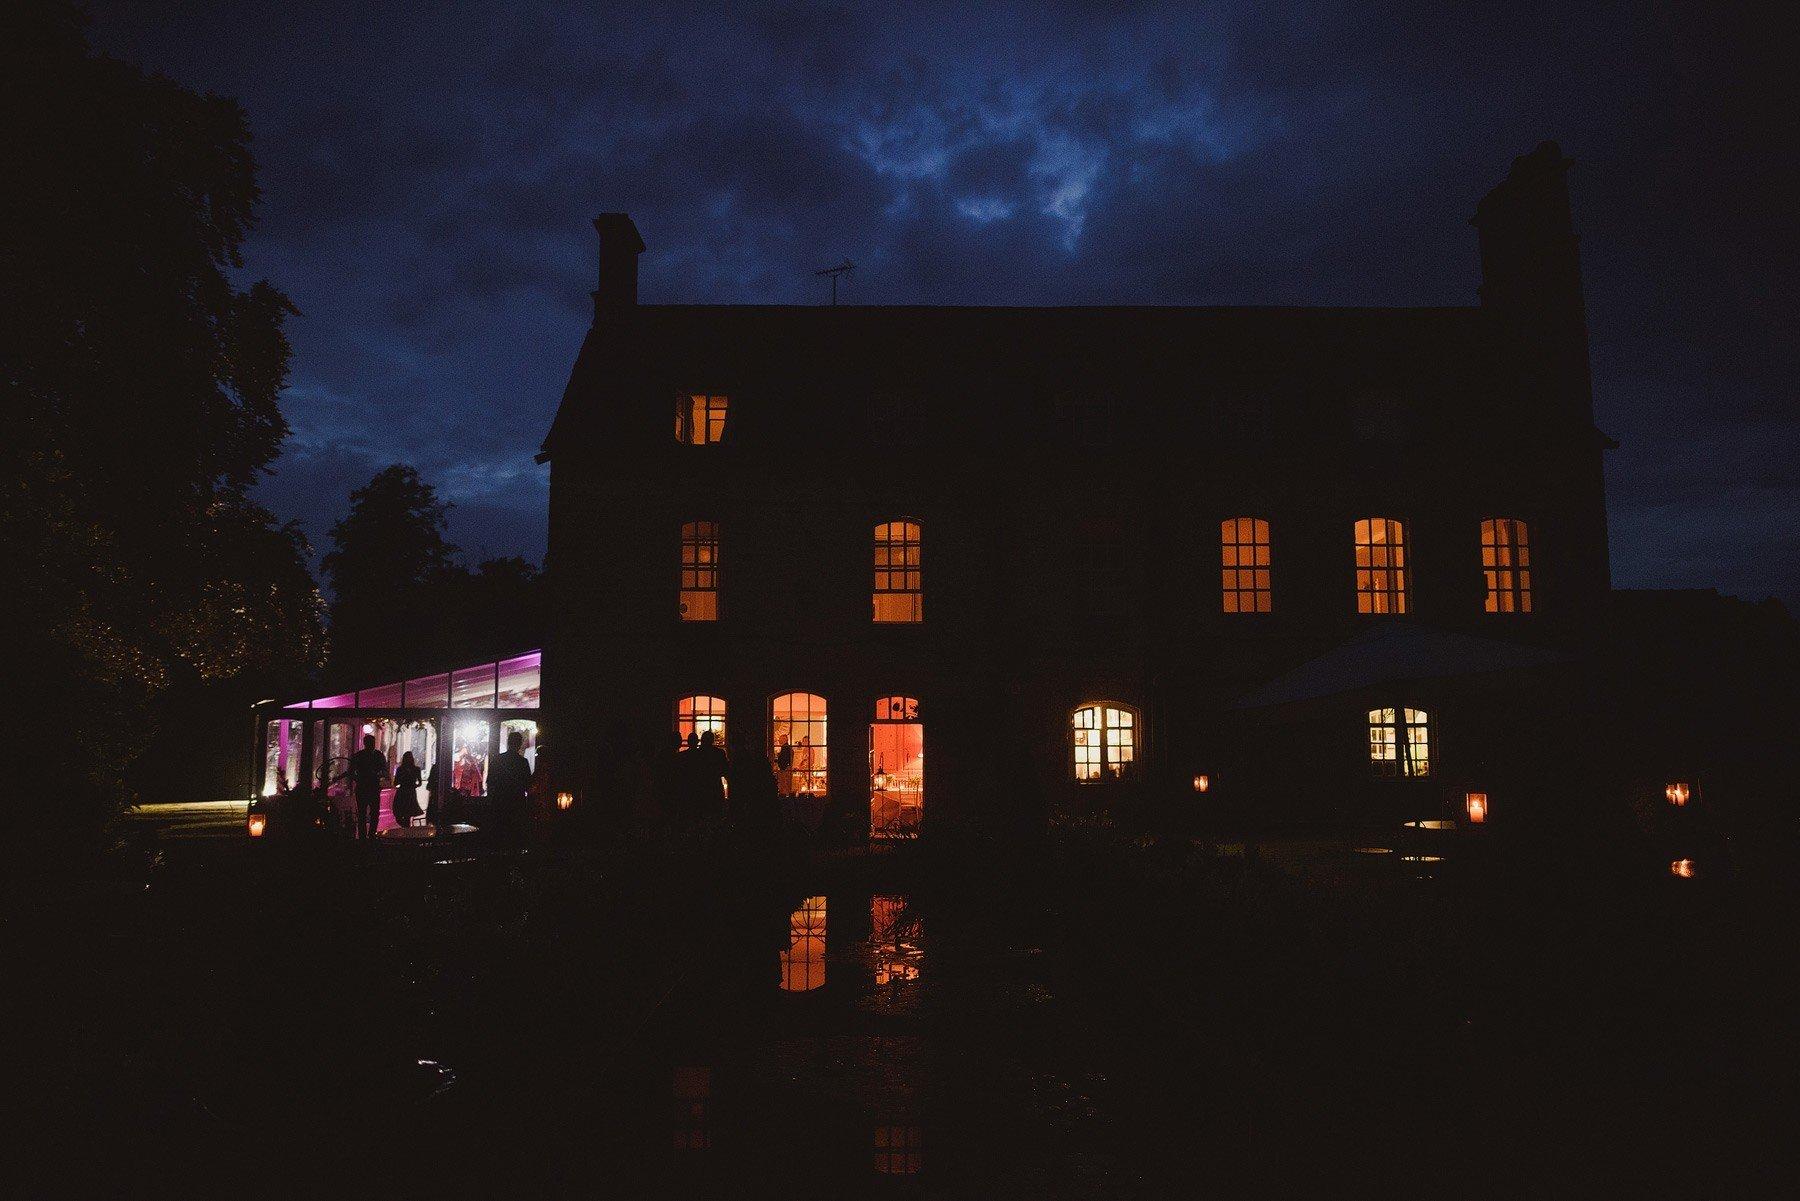 the rectory wedding venue at night